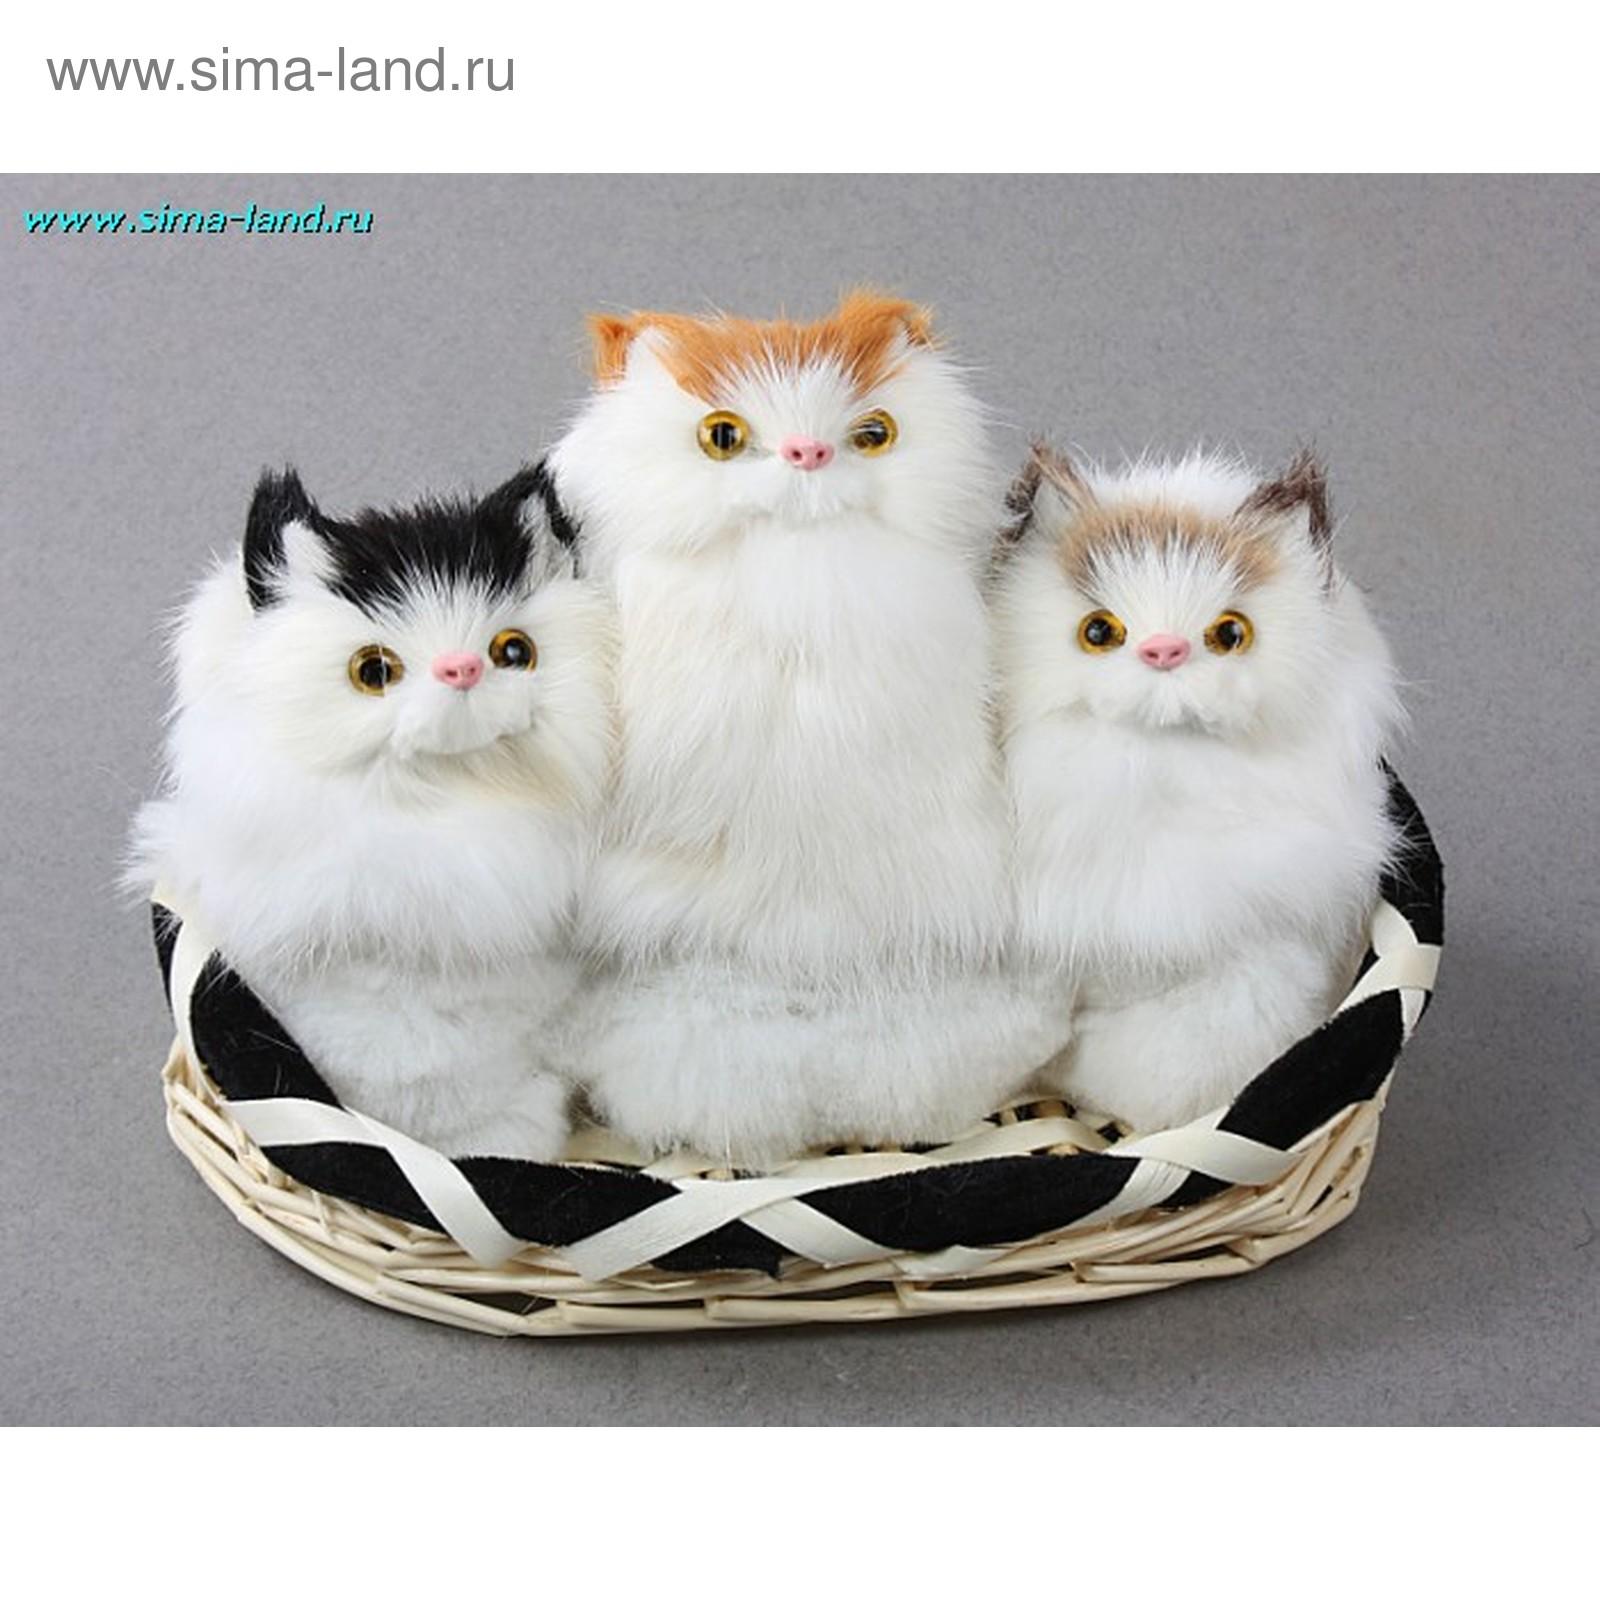 Кошки-подружки